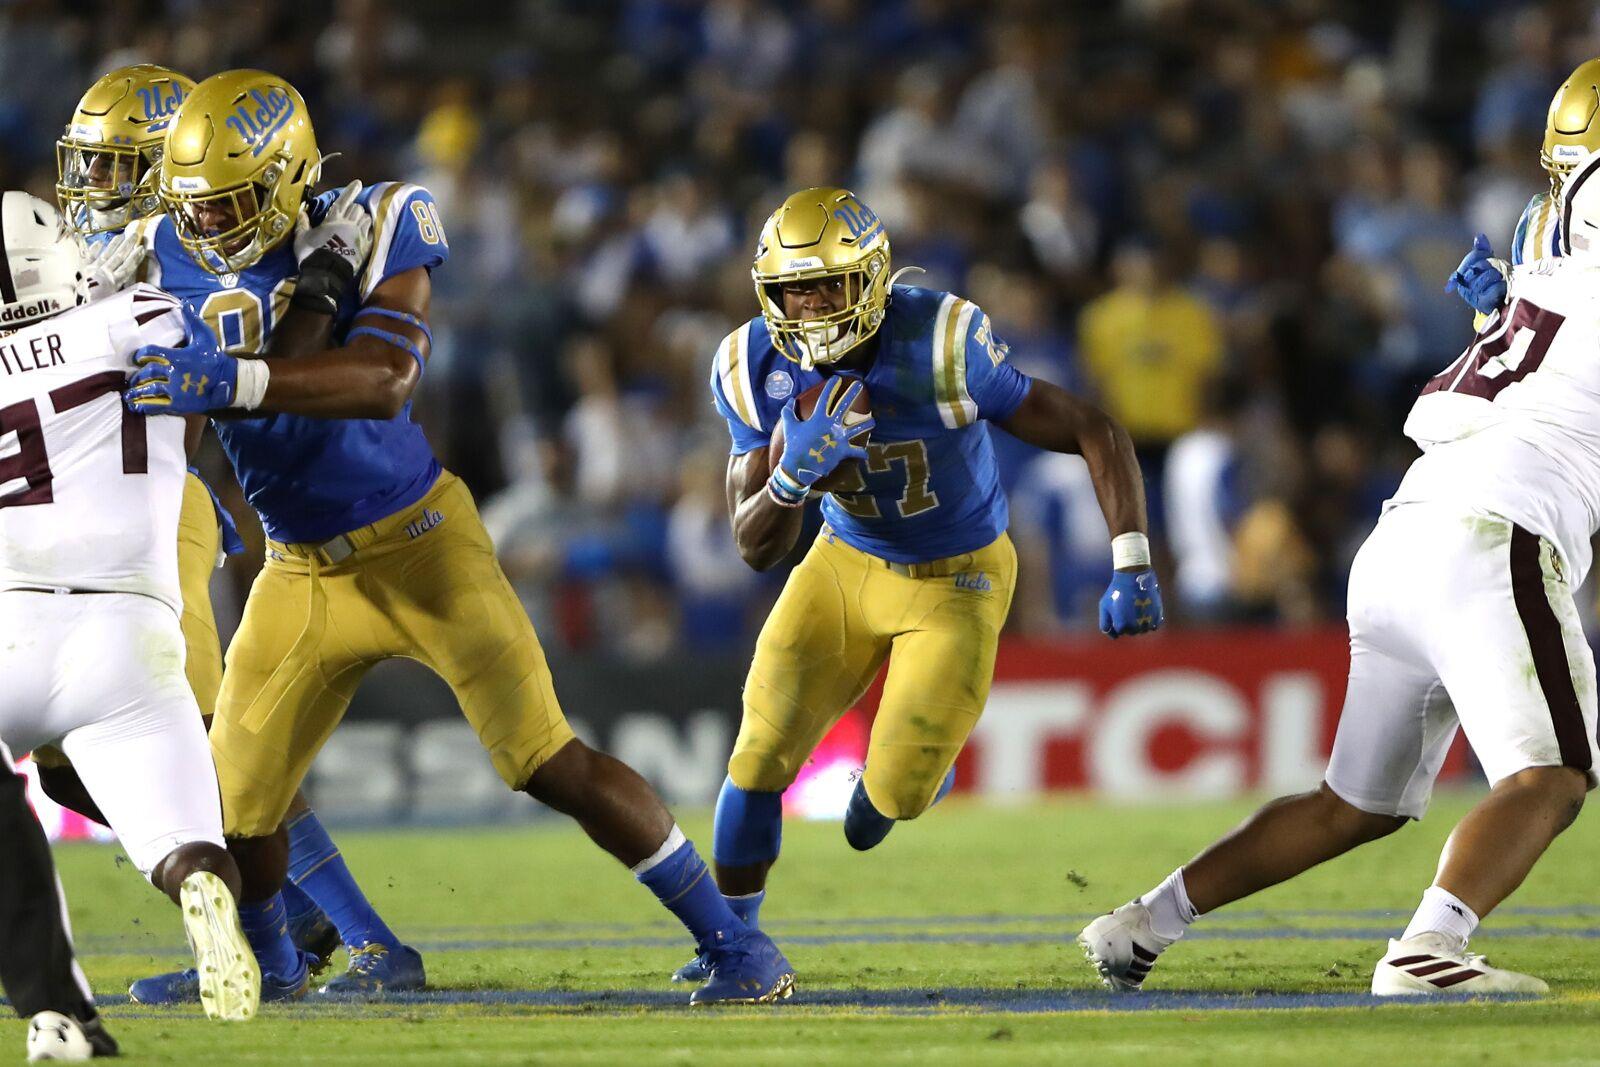 2020 NFL Draft: UCLA RB Joshua Kelley accepts Senior Bowl invitation